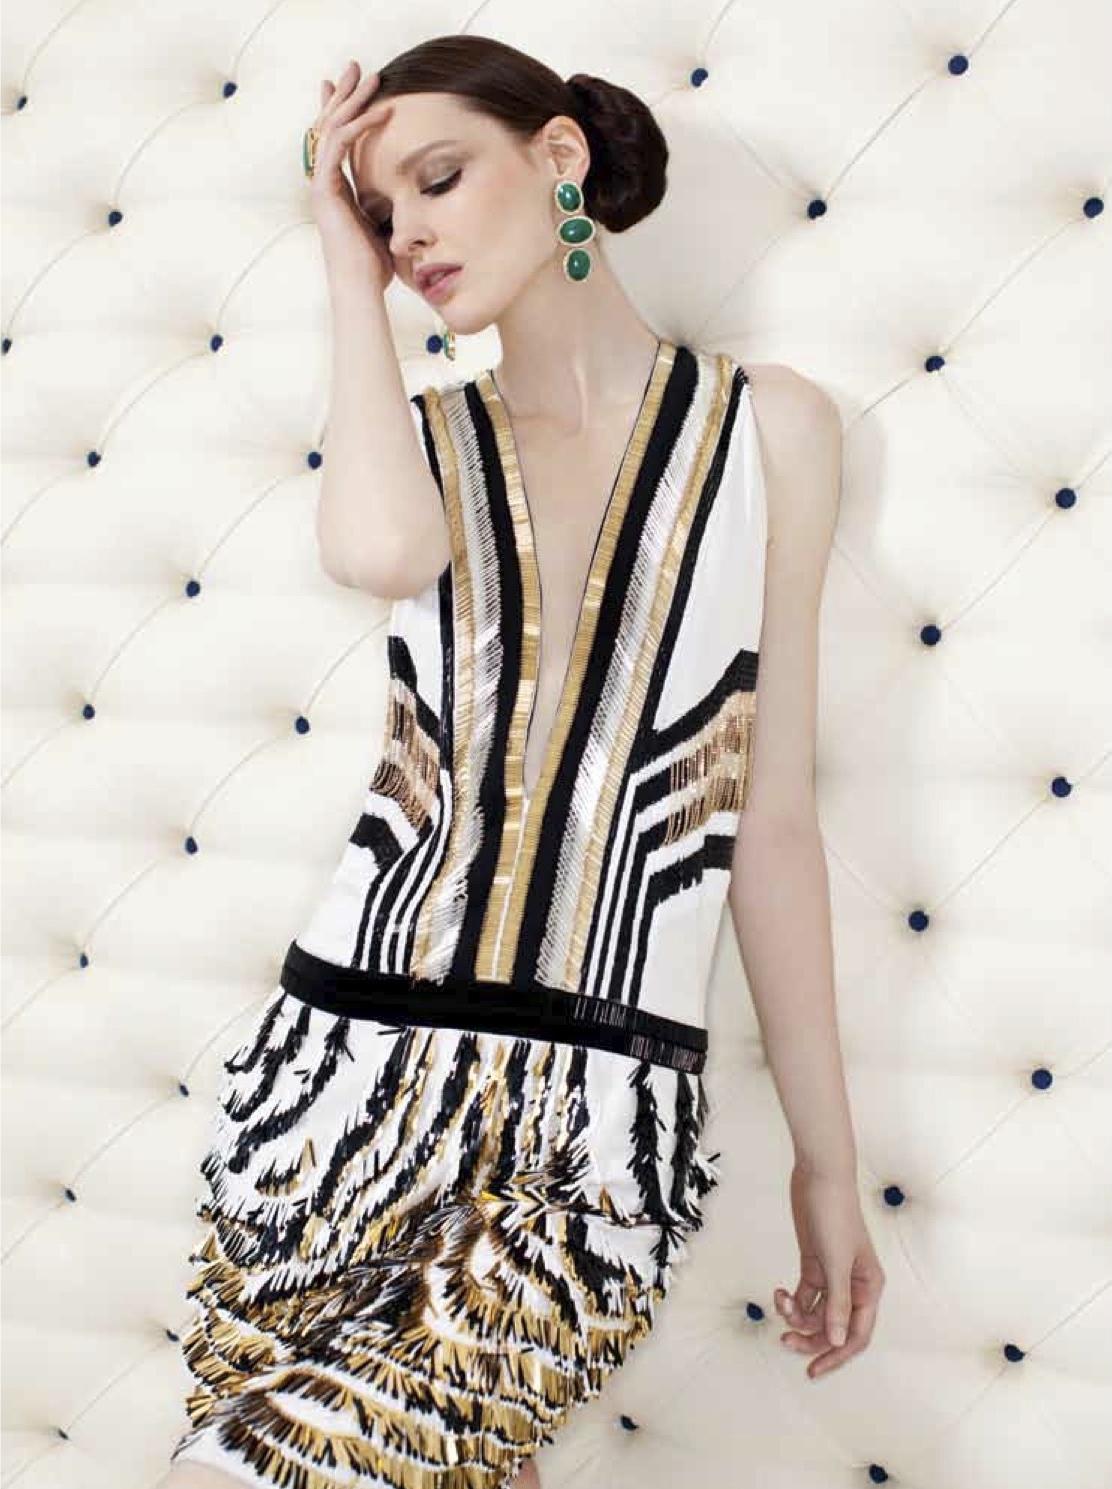 PBI_Fashion3 copy.jpg